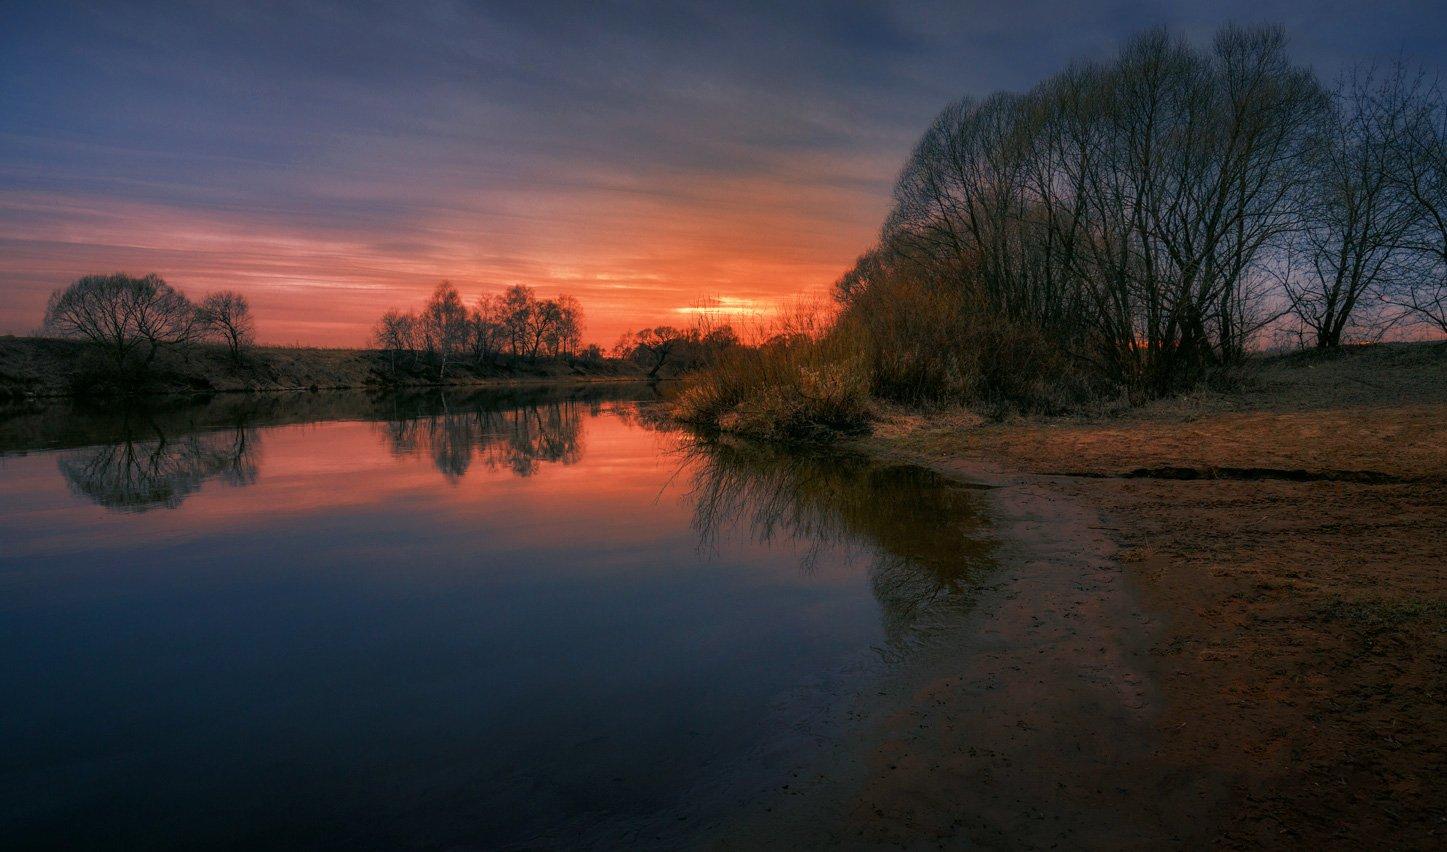 река, москва, вечер, закат, Виктор Климкин